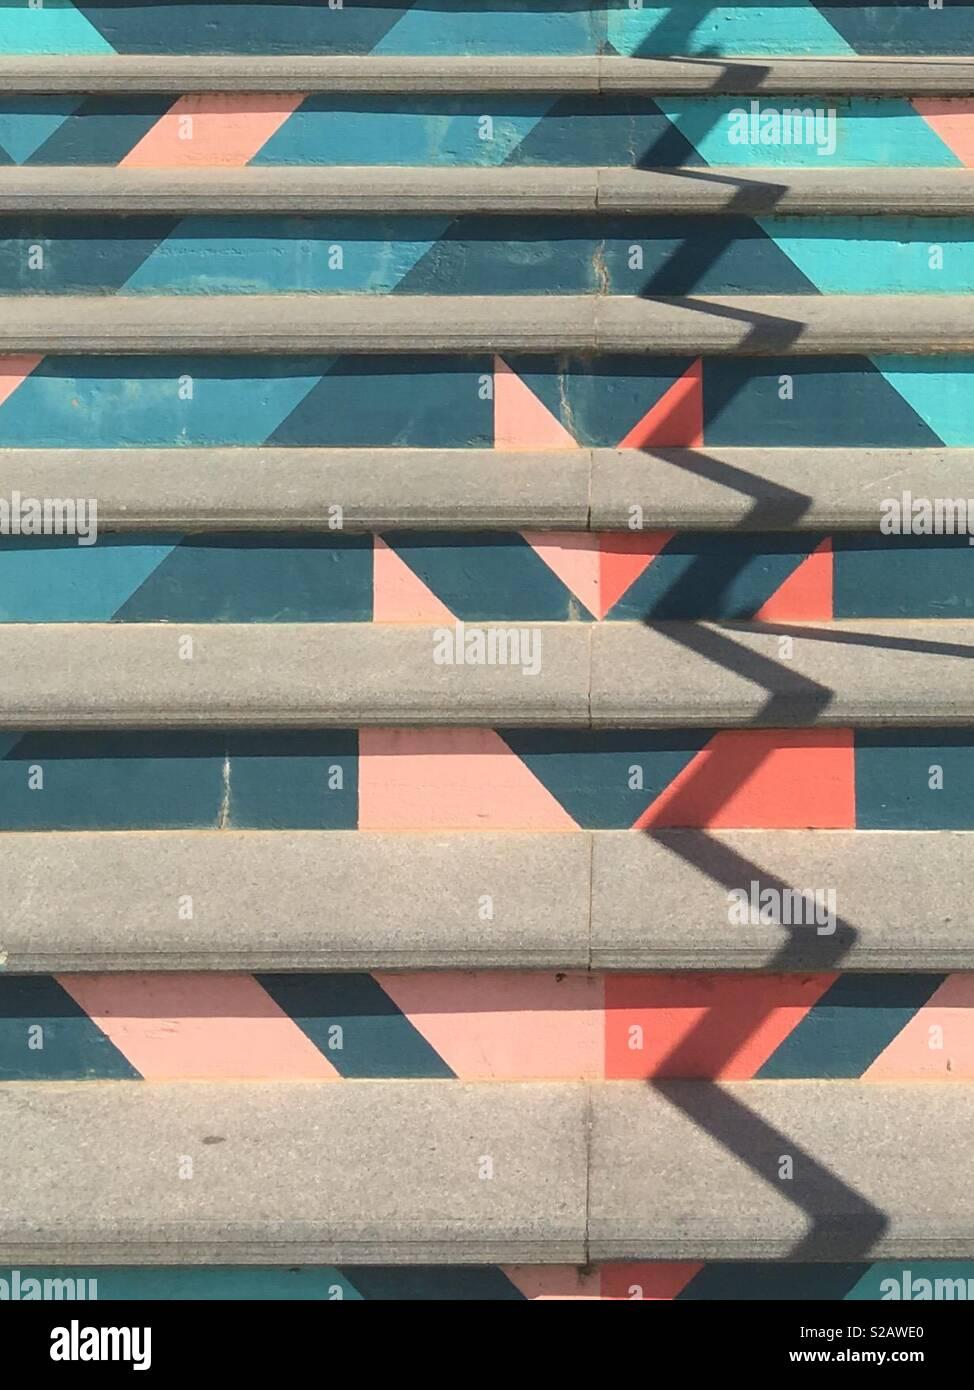 Escaliers d'Arty Photo Stock